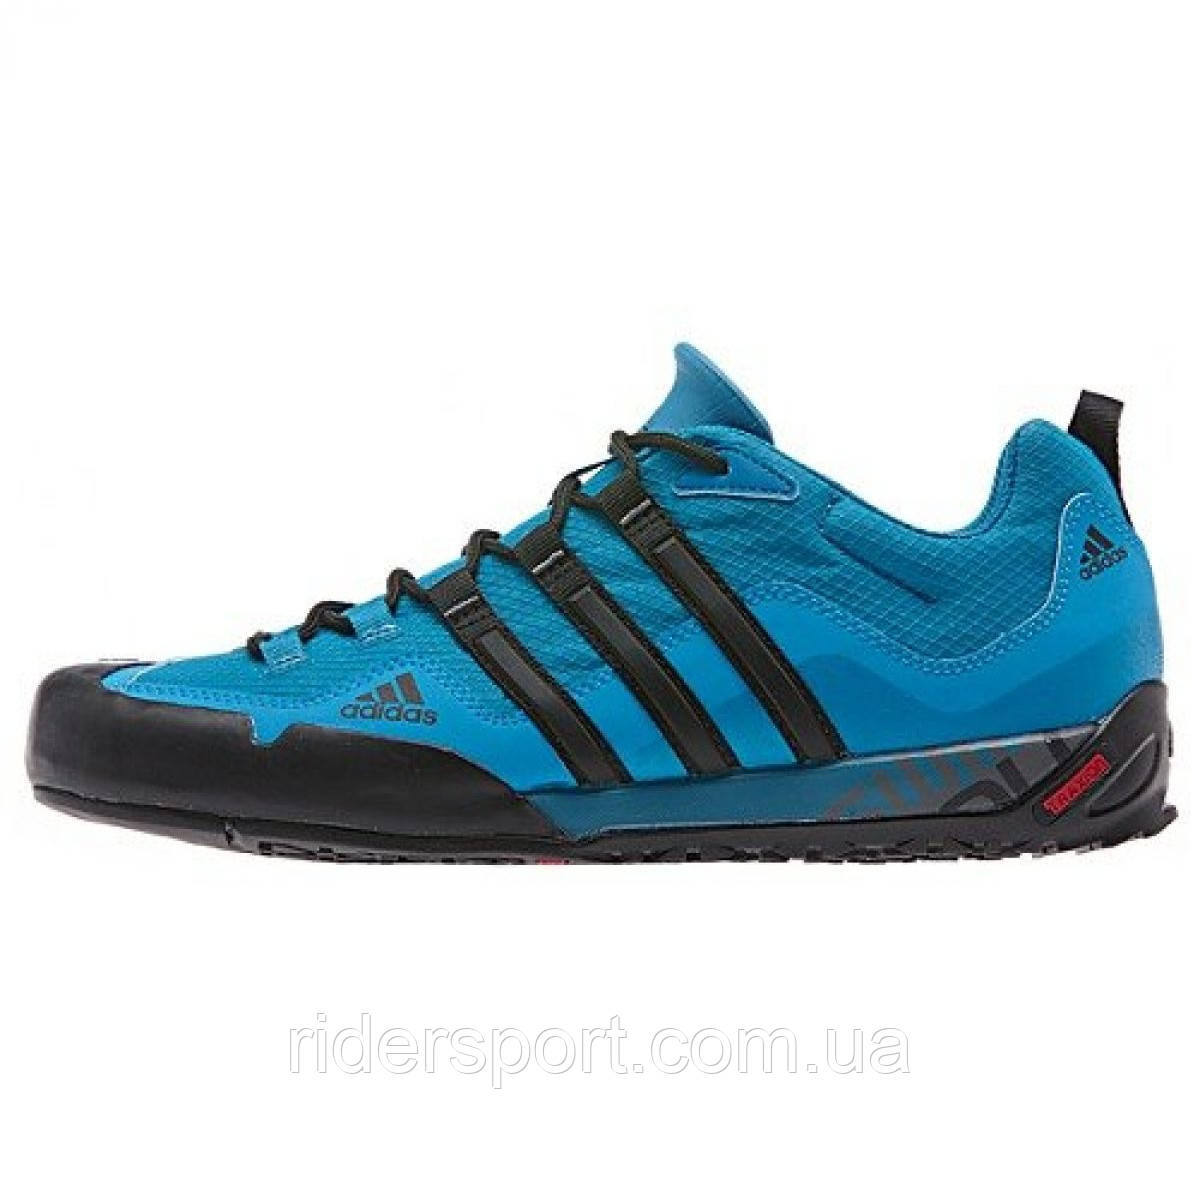 Кроссовки Adidas TERREX SWIFT SOLO D67033